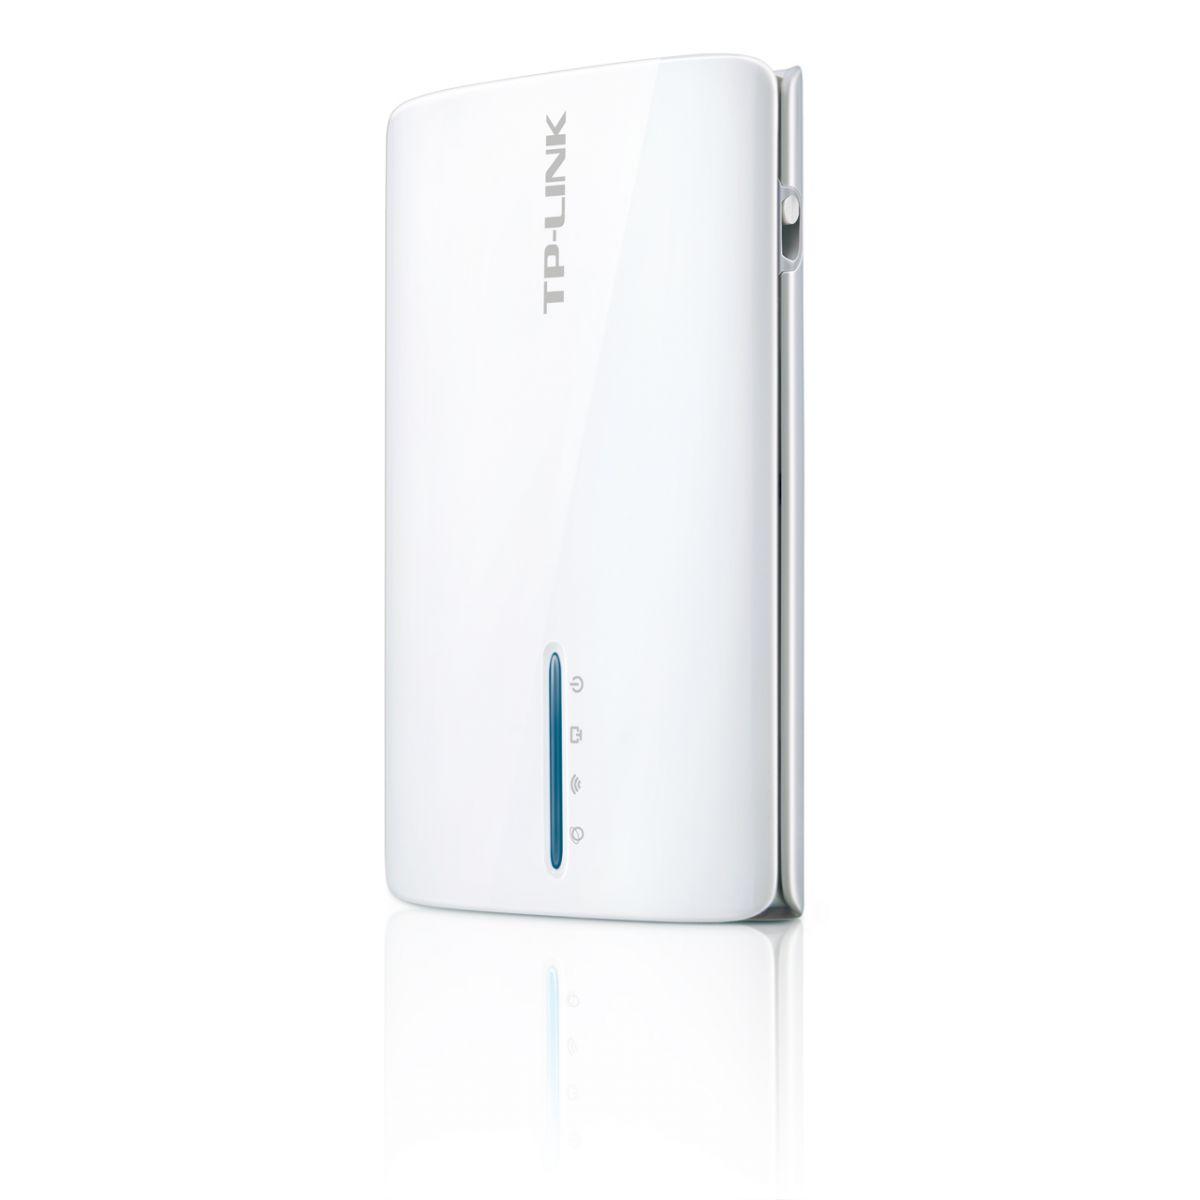 Roteador Wireless N 3G 3.75G TL-MR3040 TP-Link  - ShopNoroeste.com.br